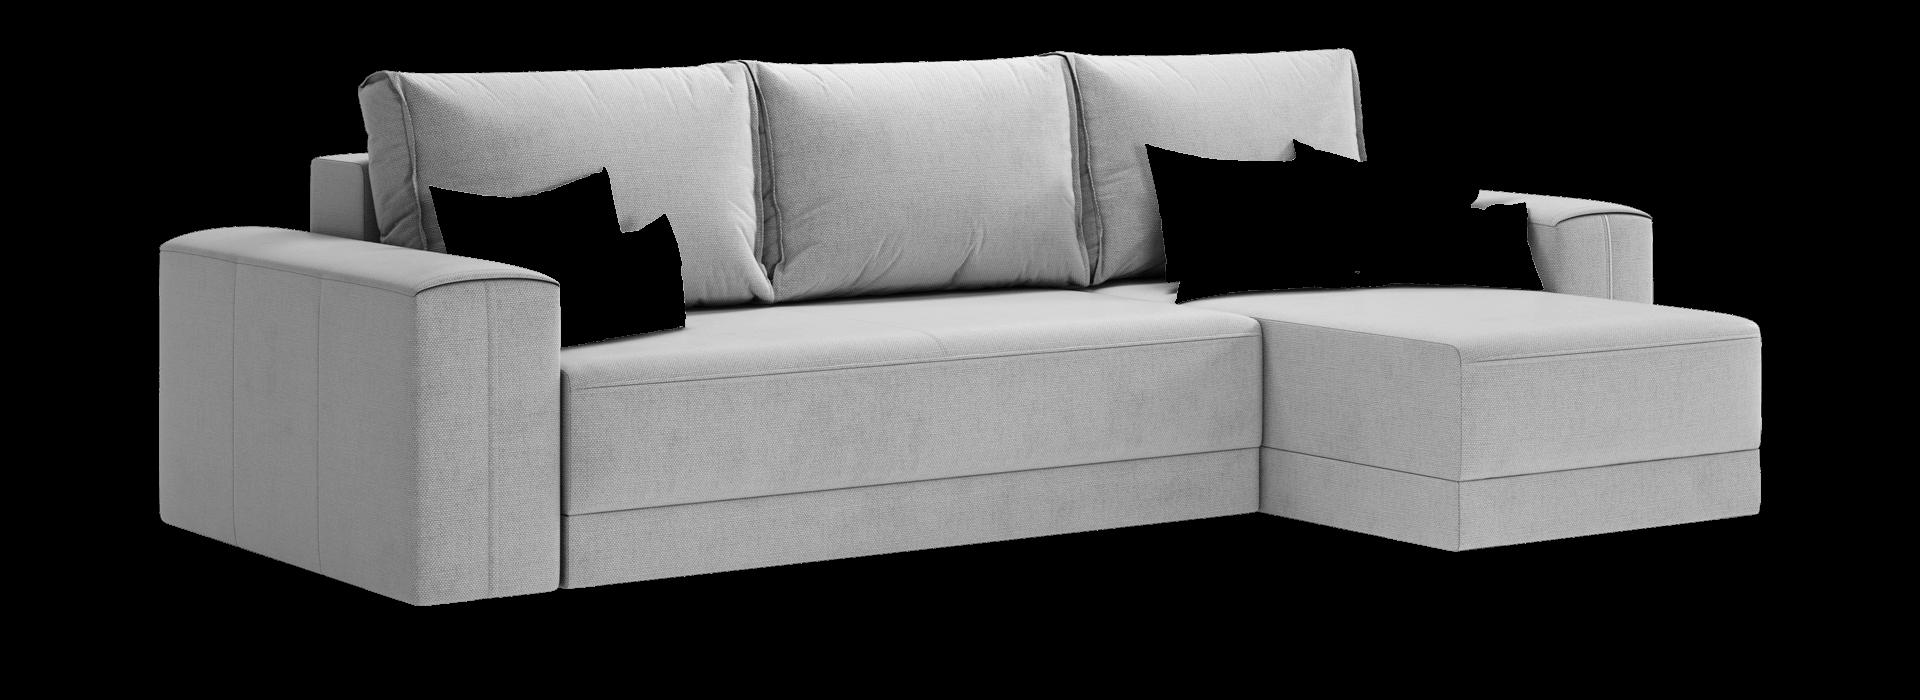 Роско кутовий диван - маска 2